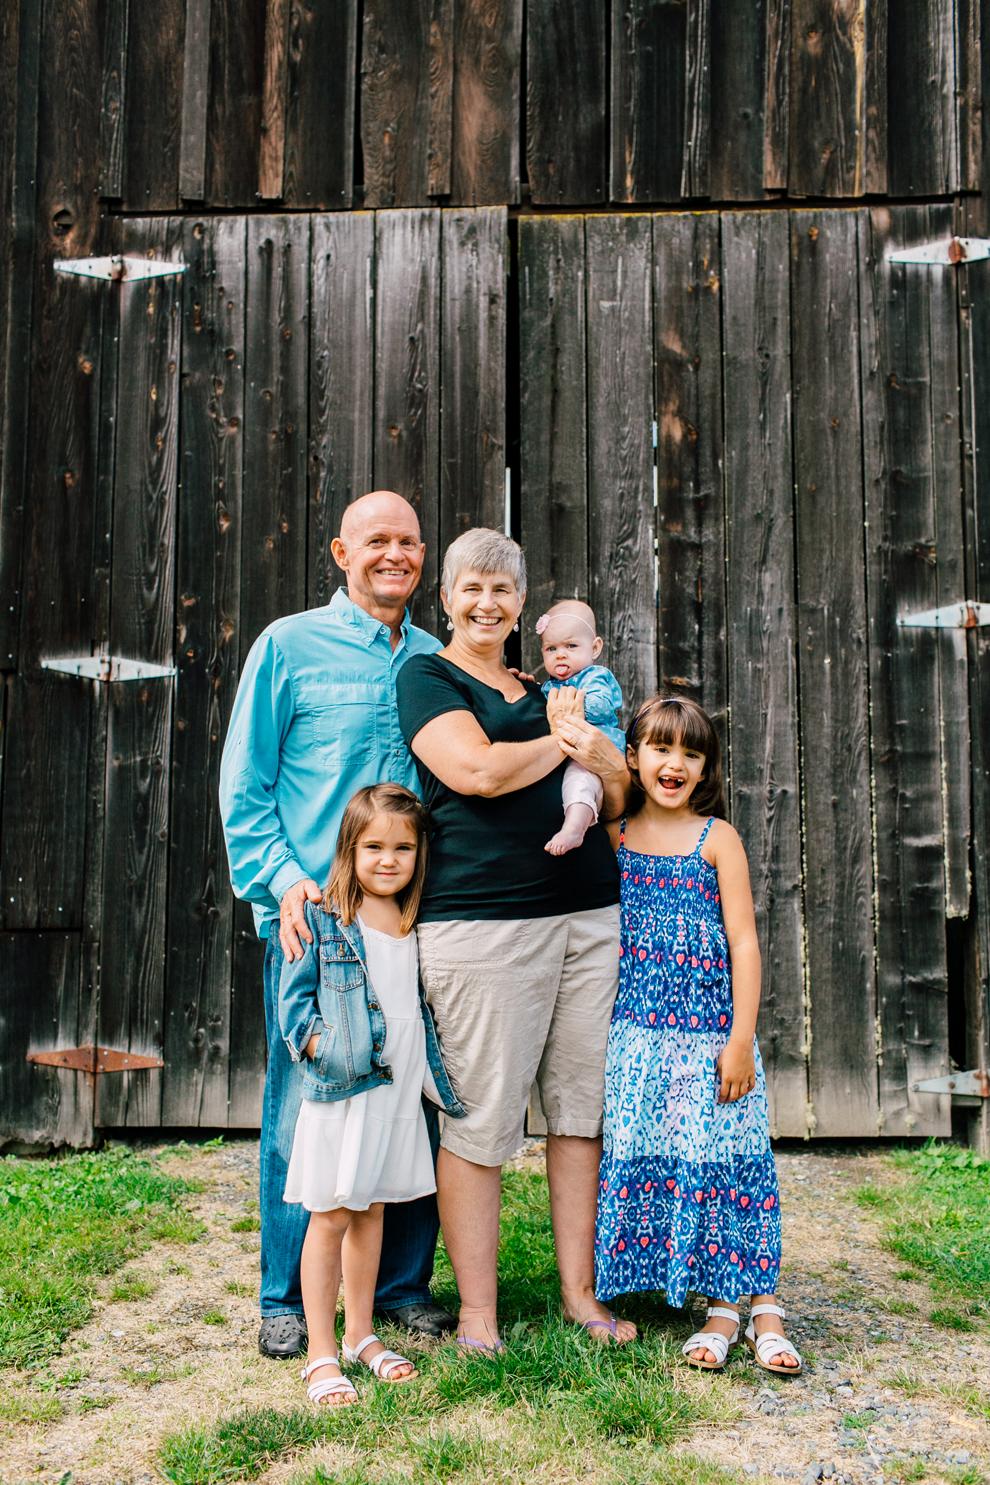 020-deming-bellingham-family-photographer-lifestyle-katheryn-moran.jpg